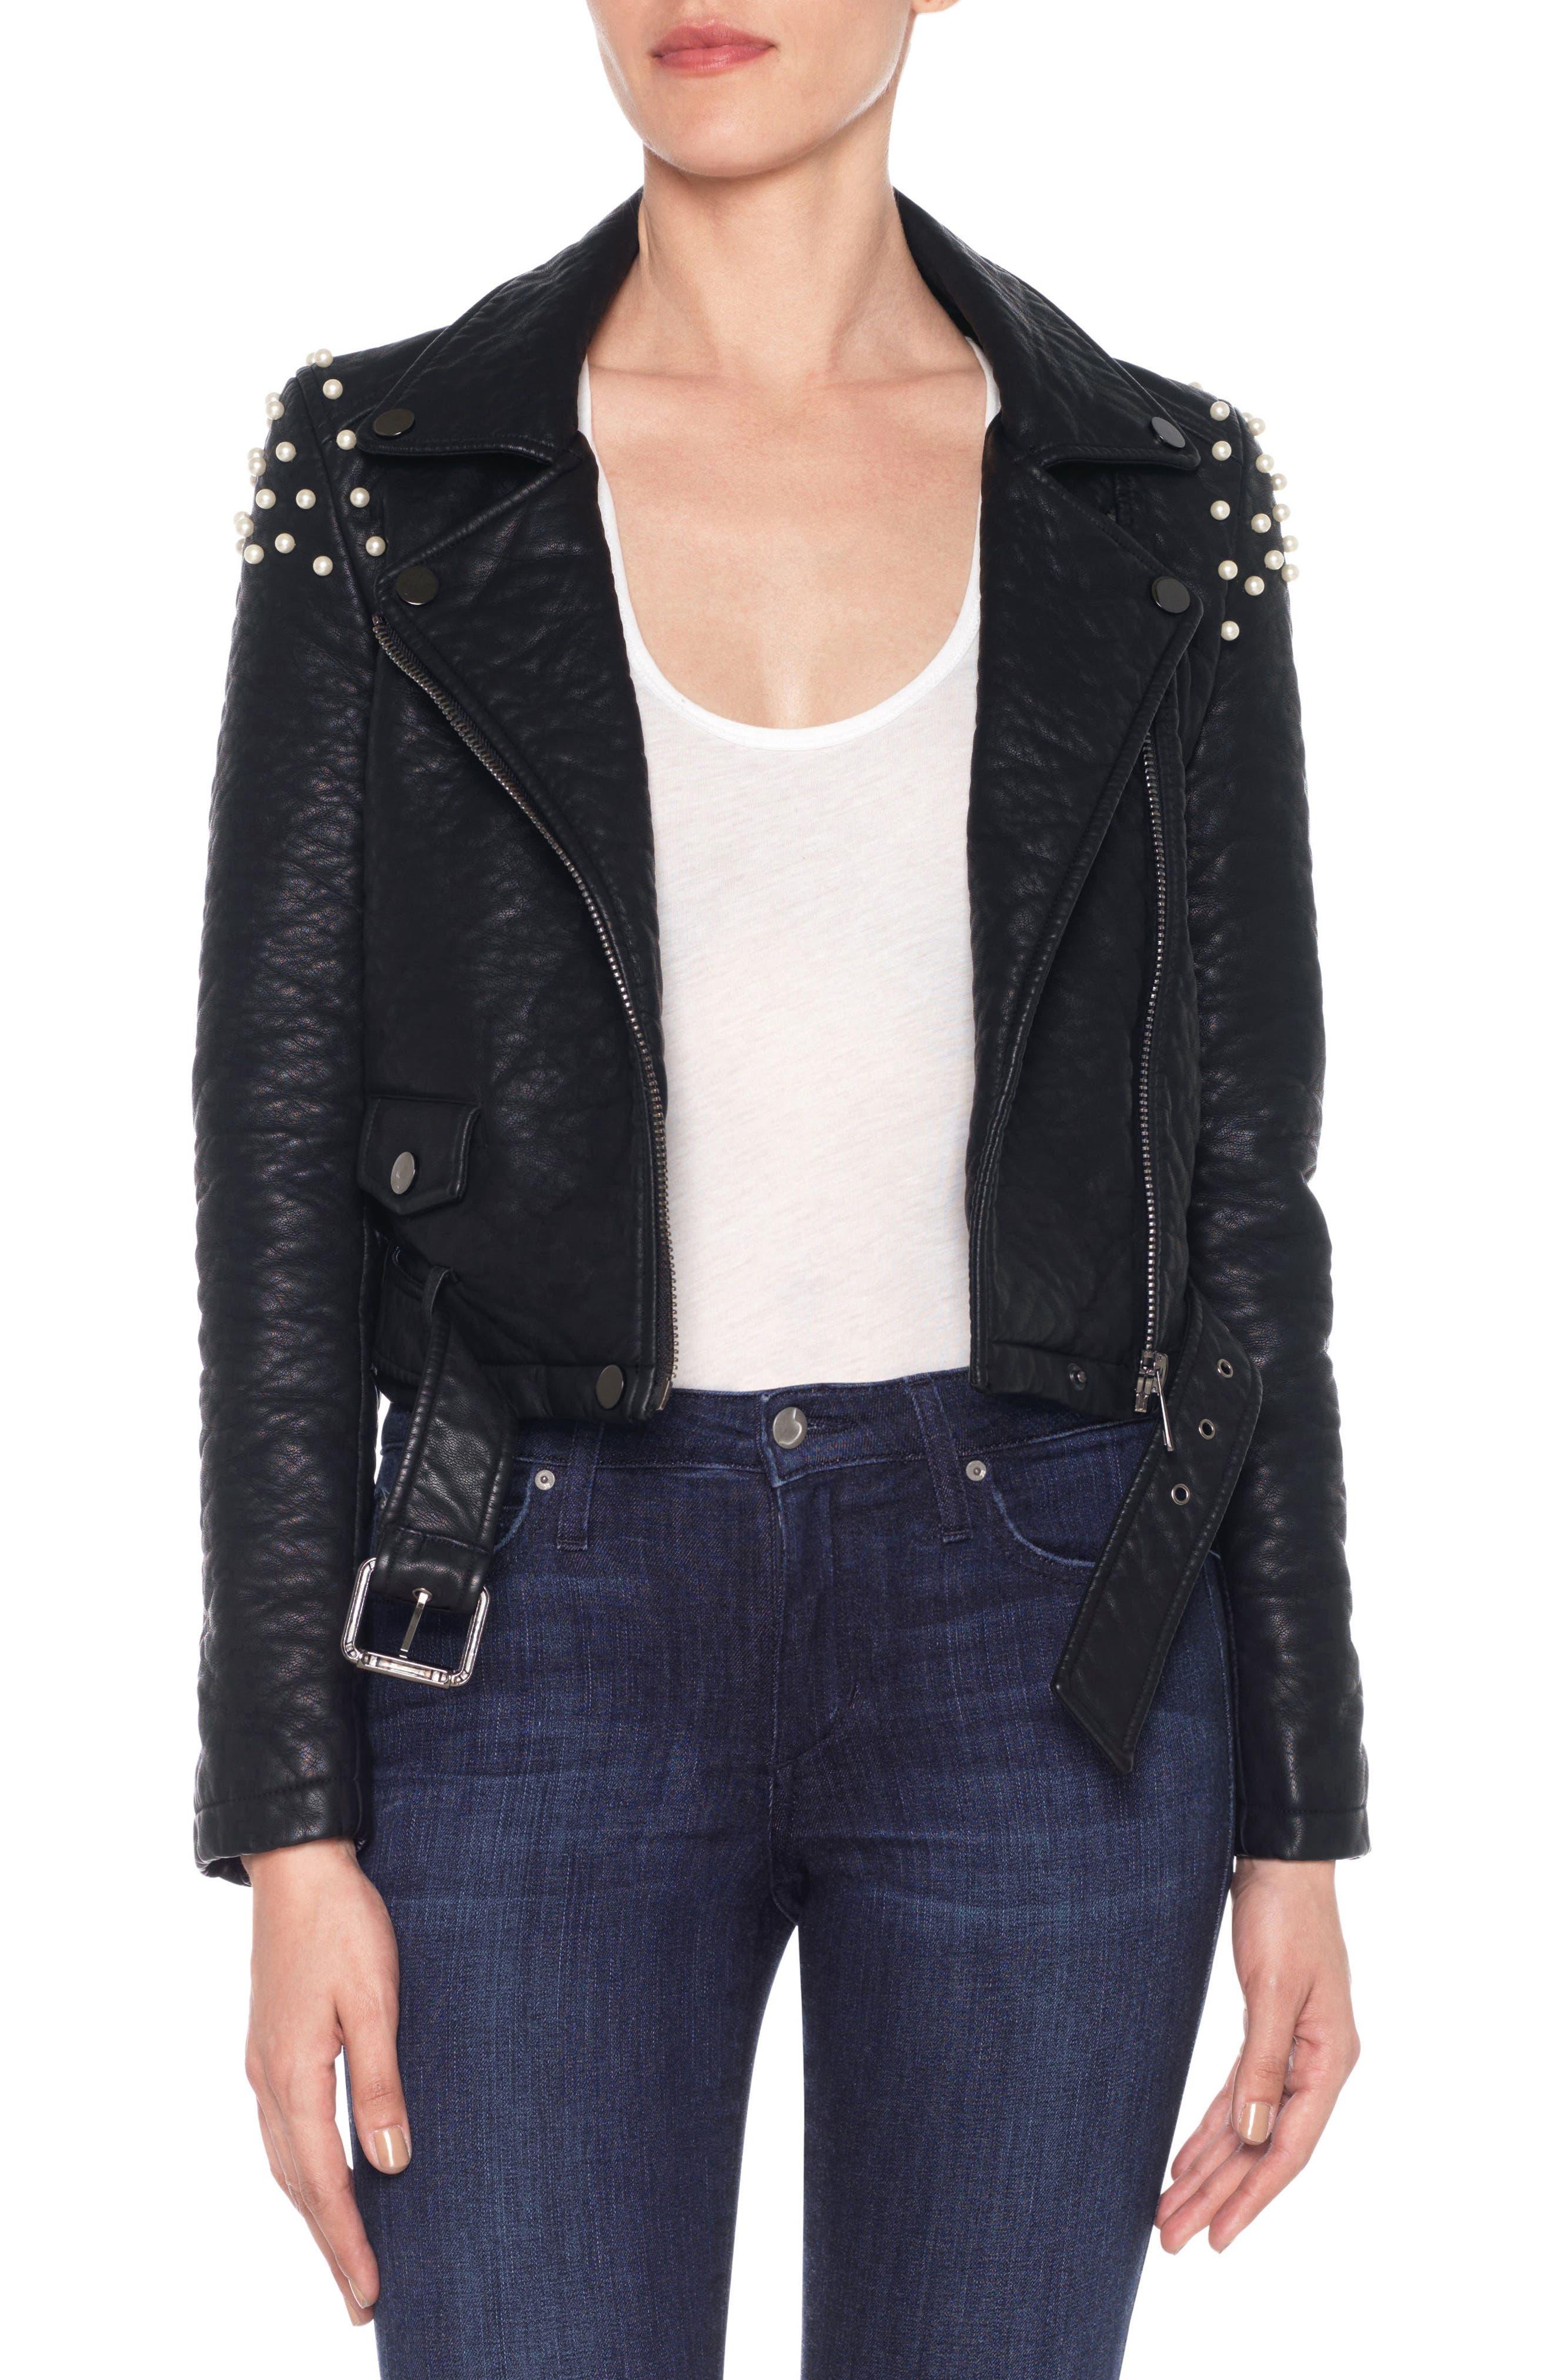 Taylor Embellished Faux Leather Moto Jacket,                             Main thumbnail 1, color,                             011